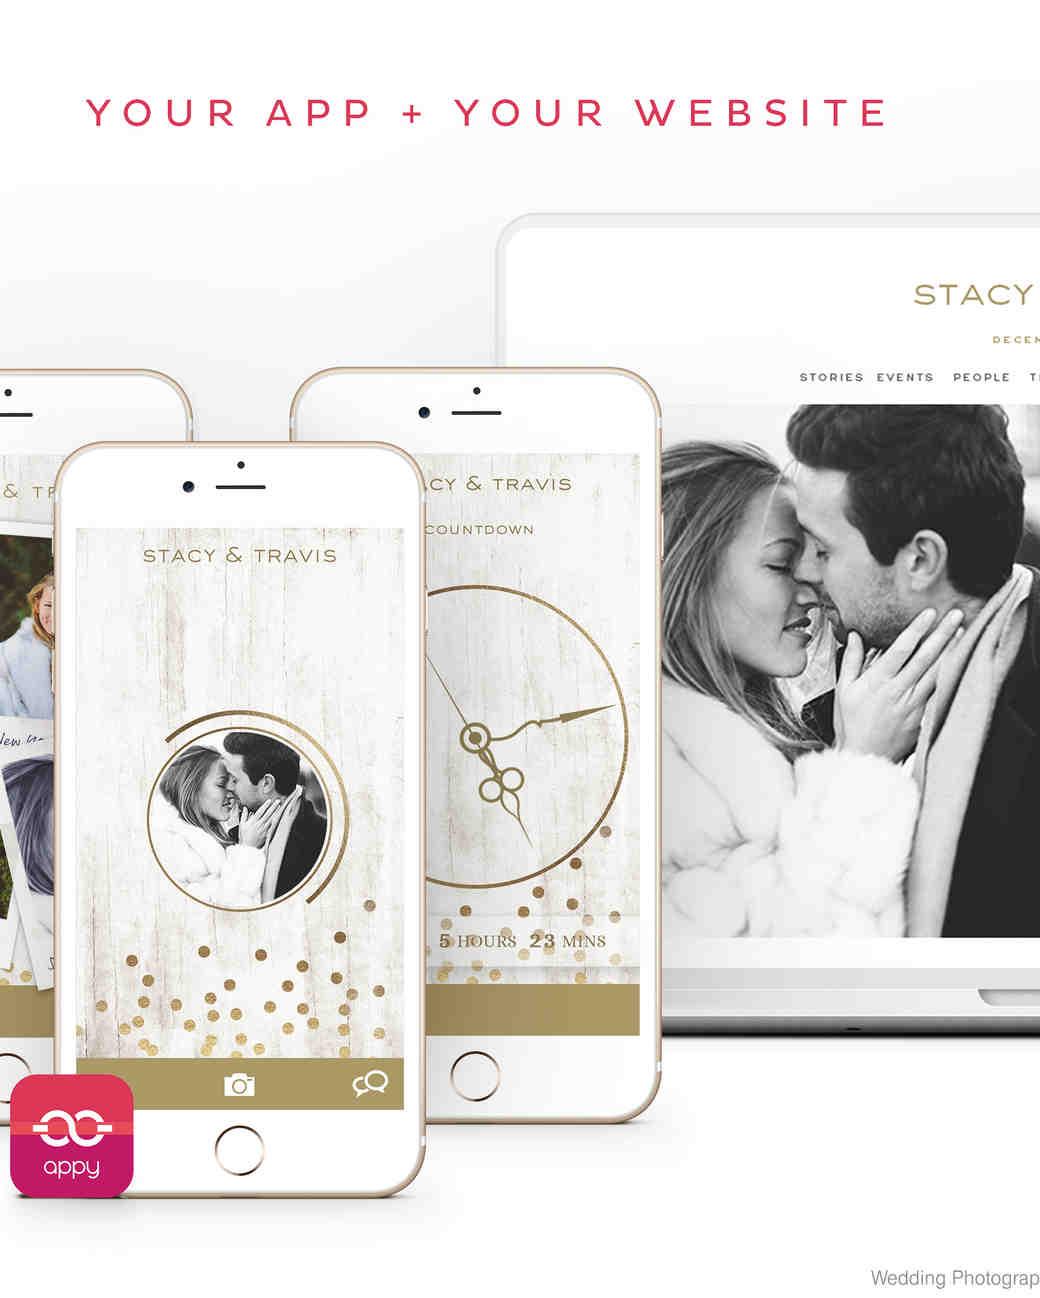 best-wedding-websites-appy-couple-0615.jpg